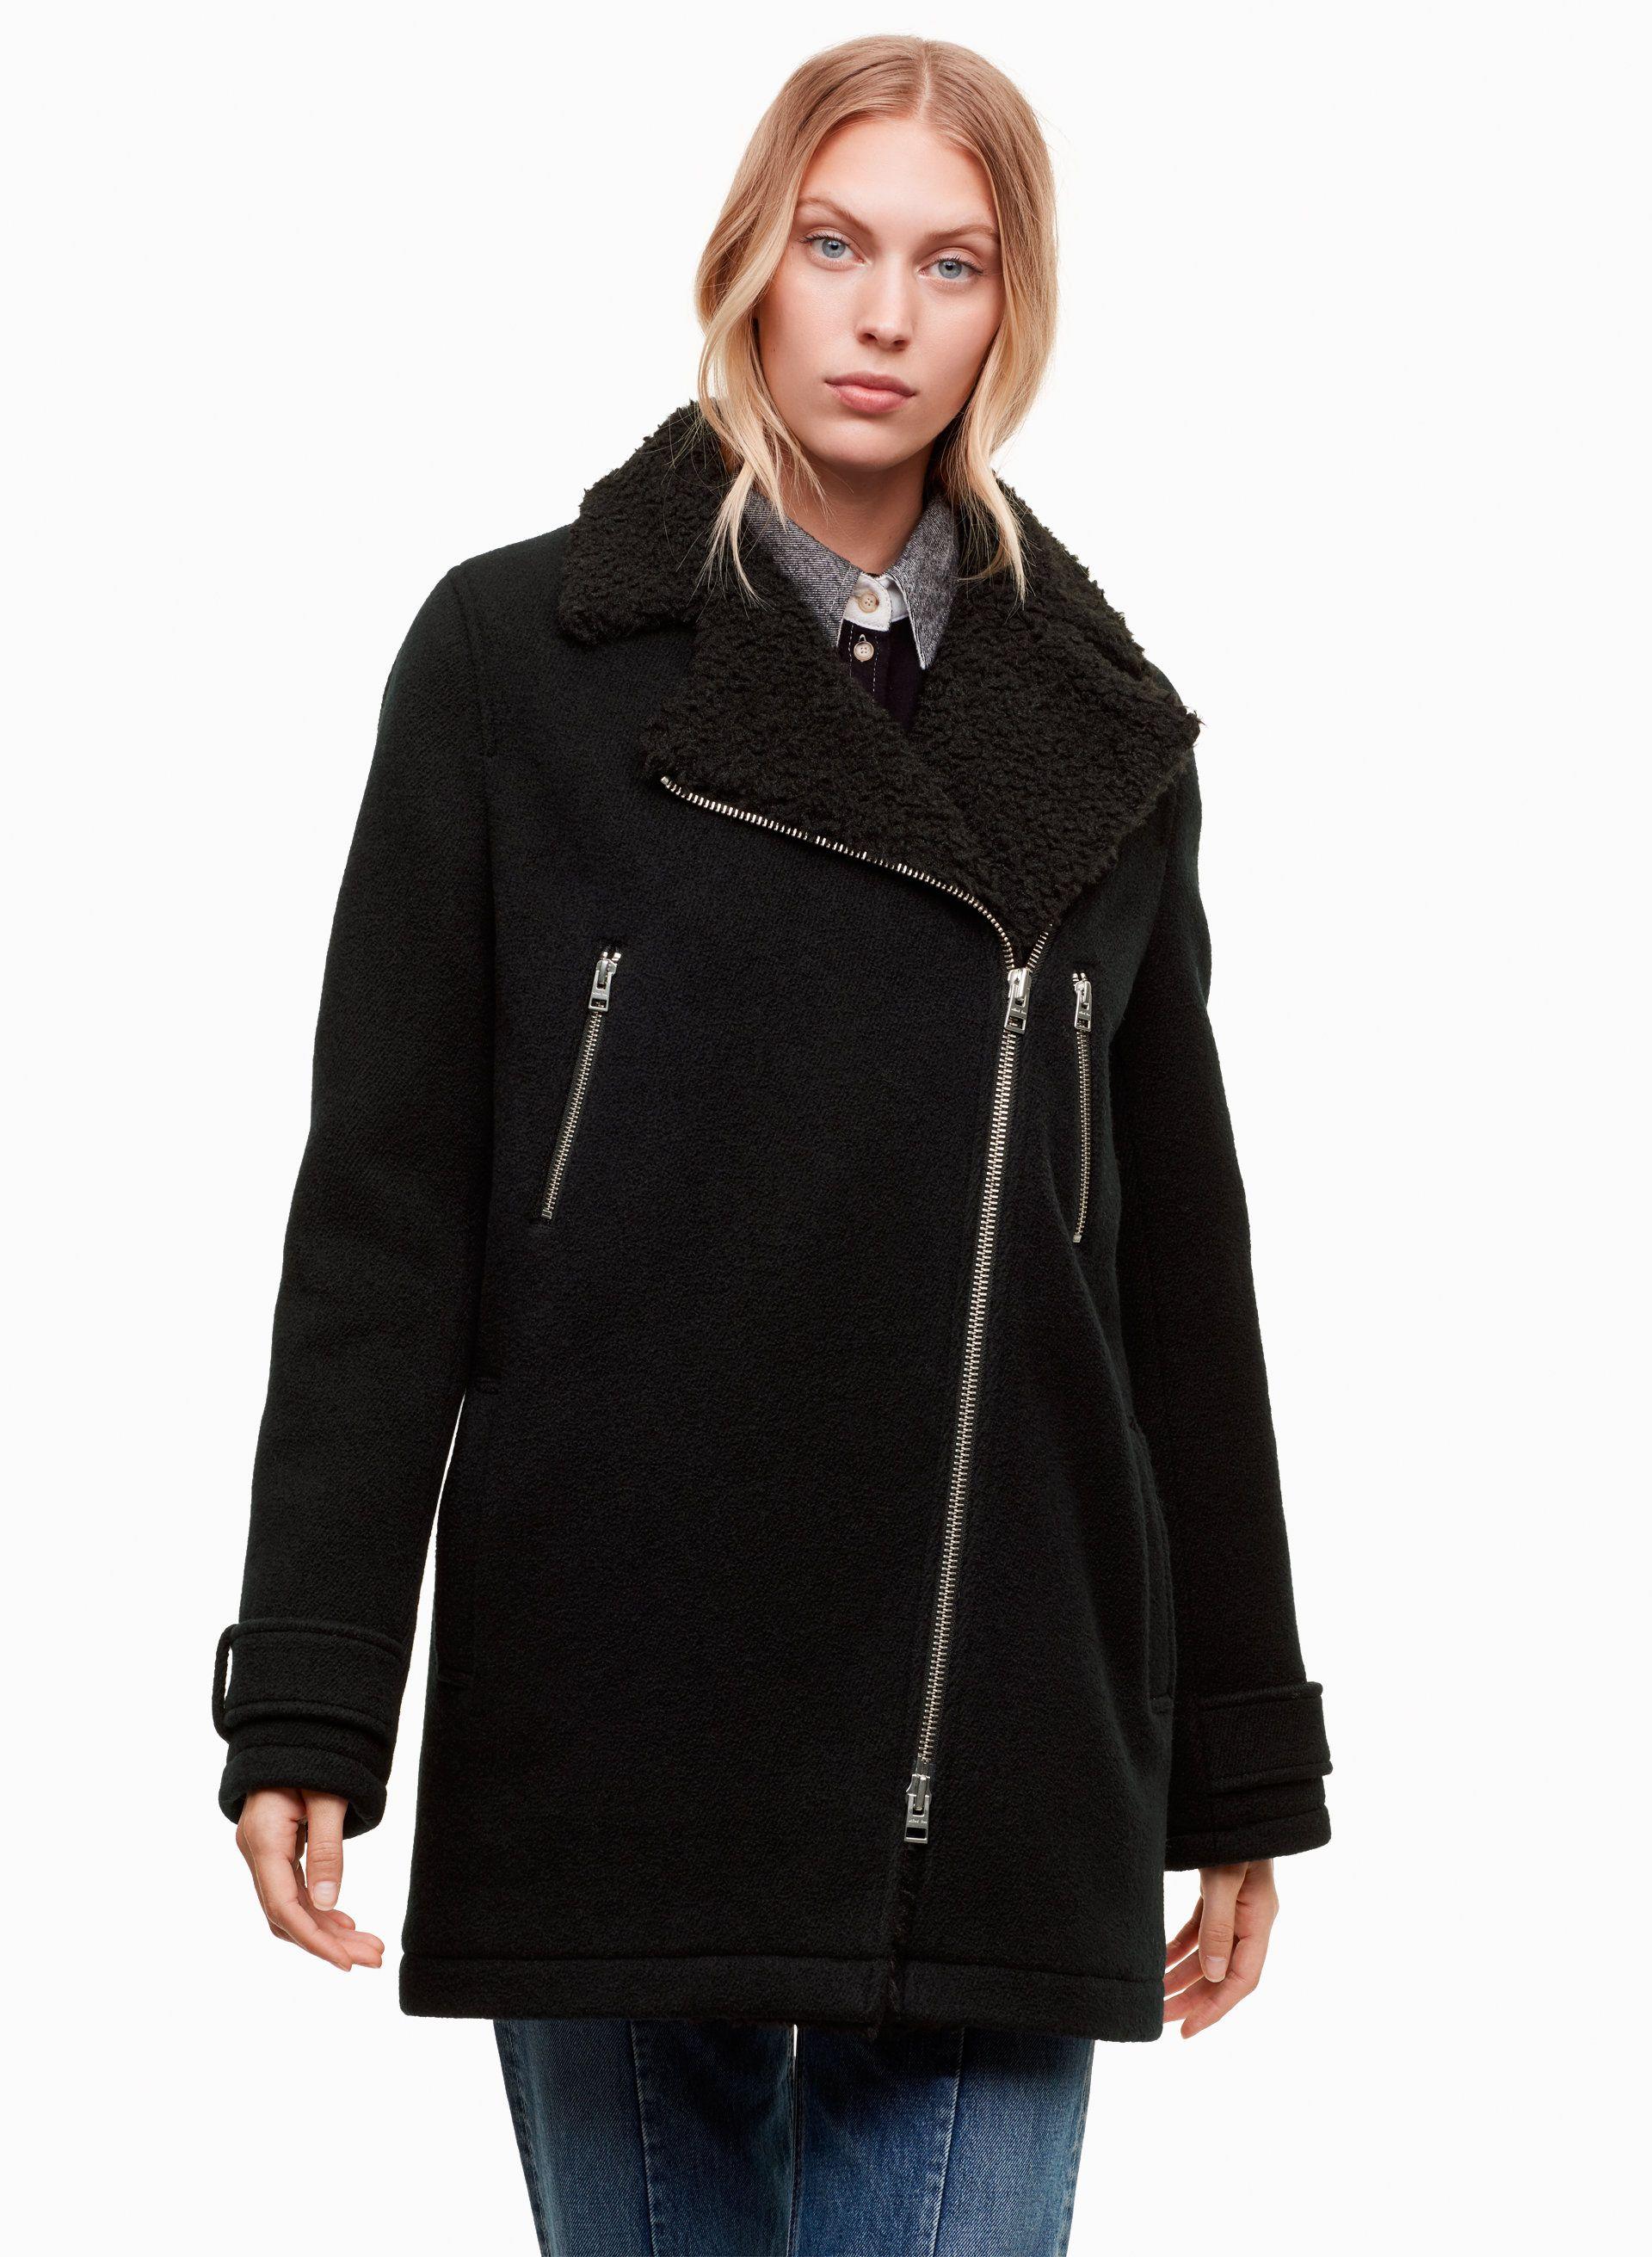 19d29899fb1 Waterhouse coat   Wardrobe   Fall + Winter   Business attire, Coat ...